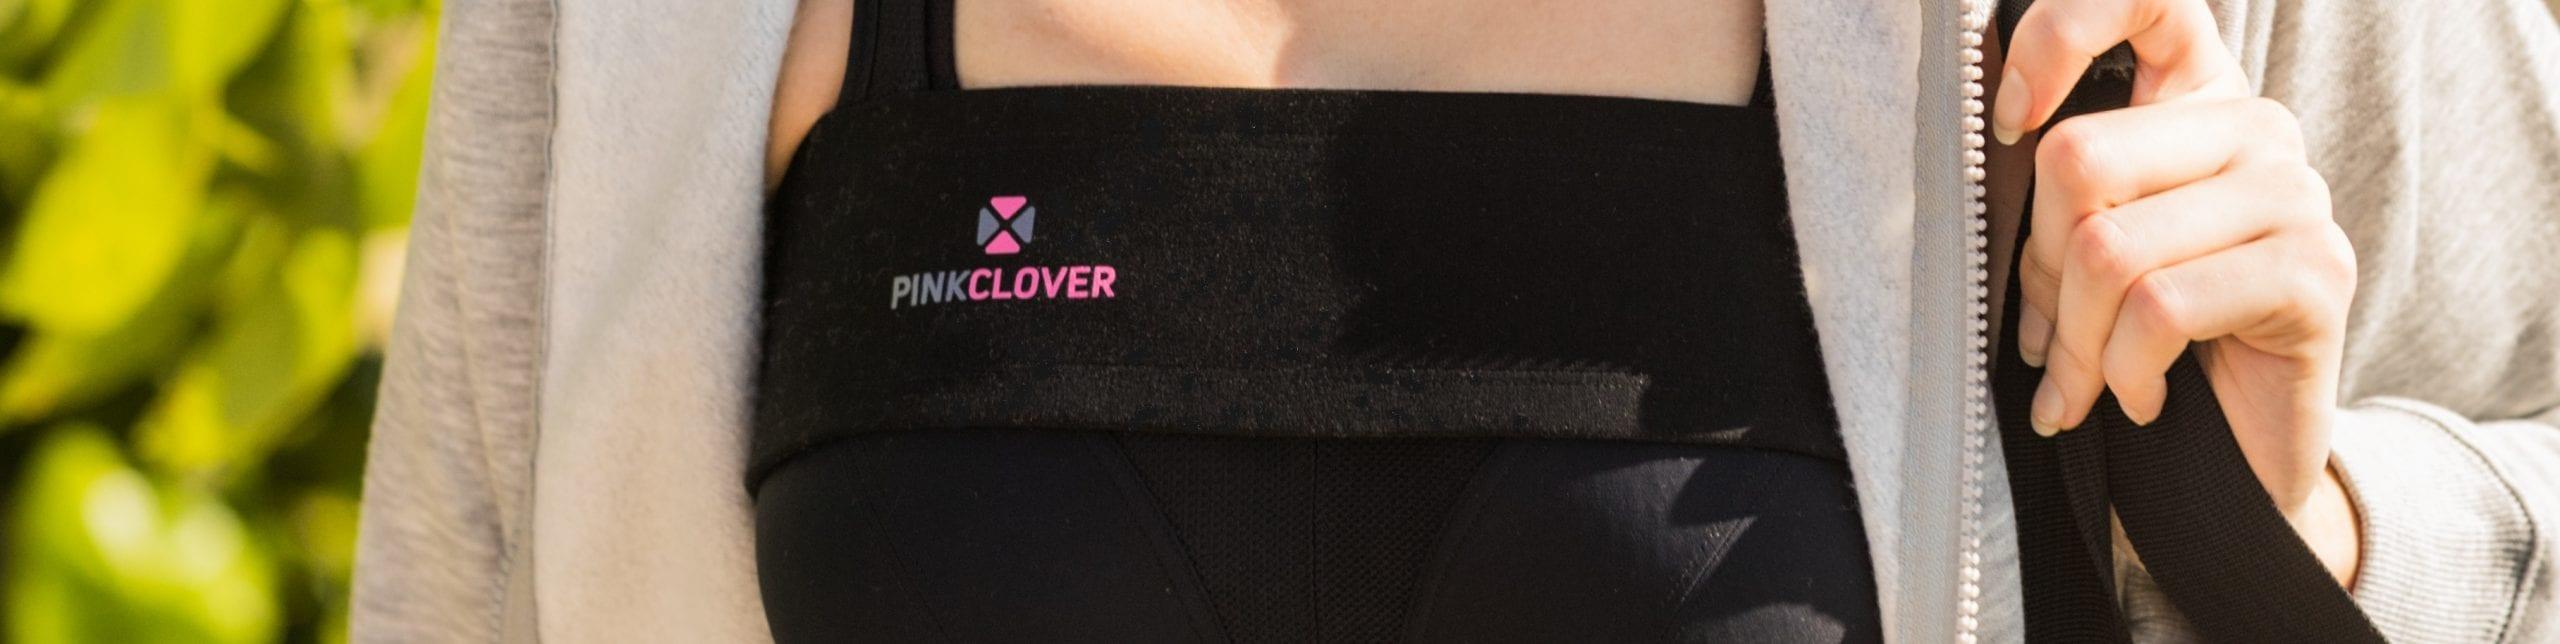 Pinkclover Breastband close up